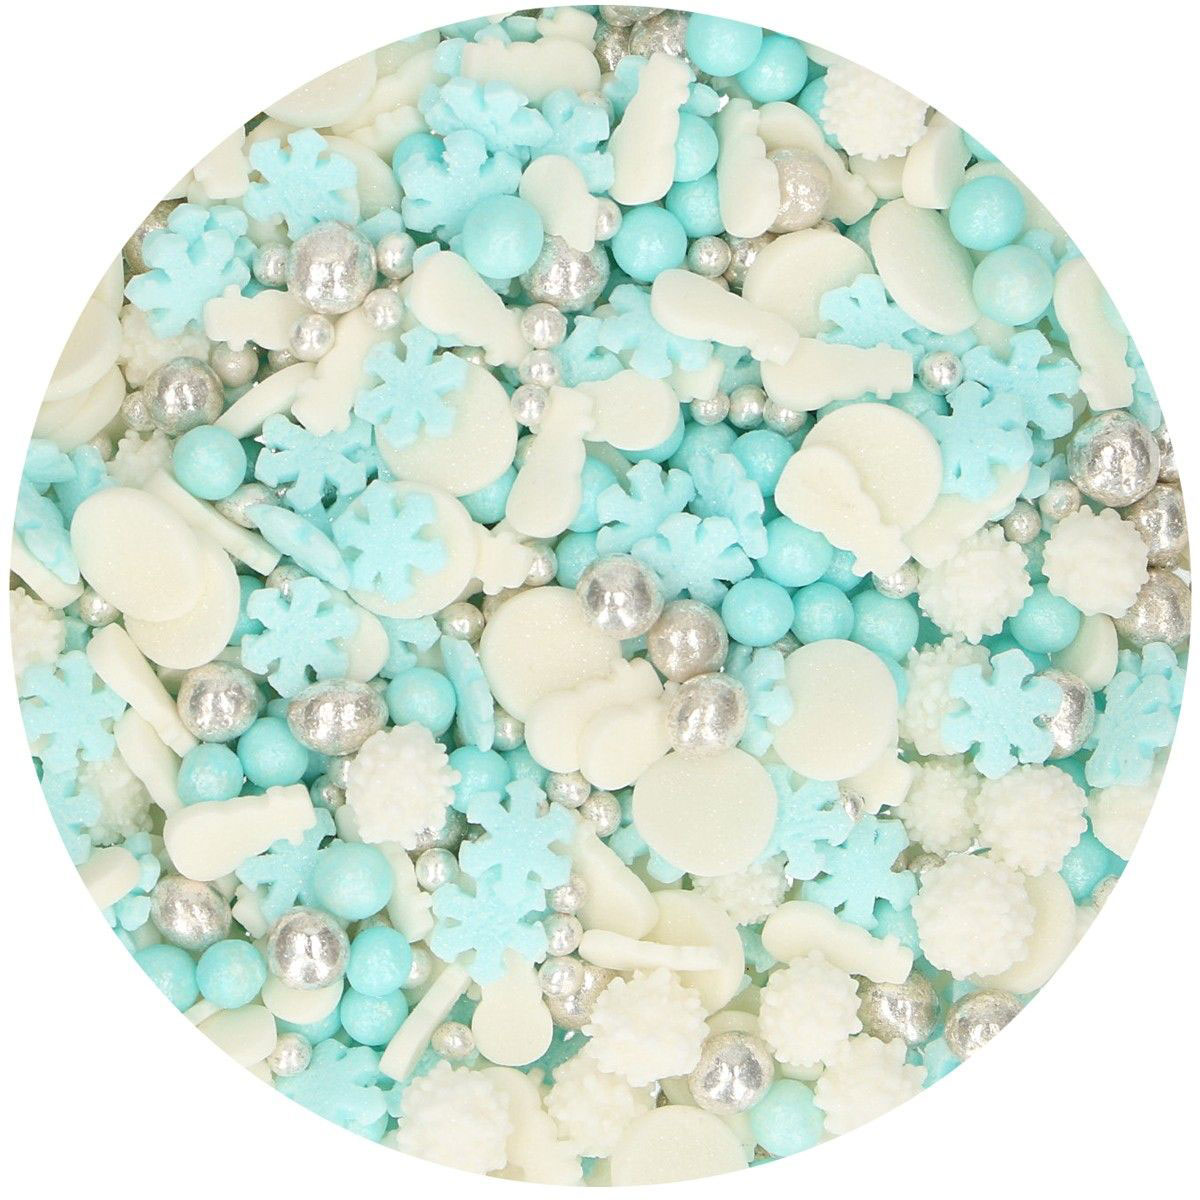 Funcakes Sprinkle Medley - Frozen Mix 180g